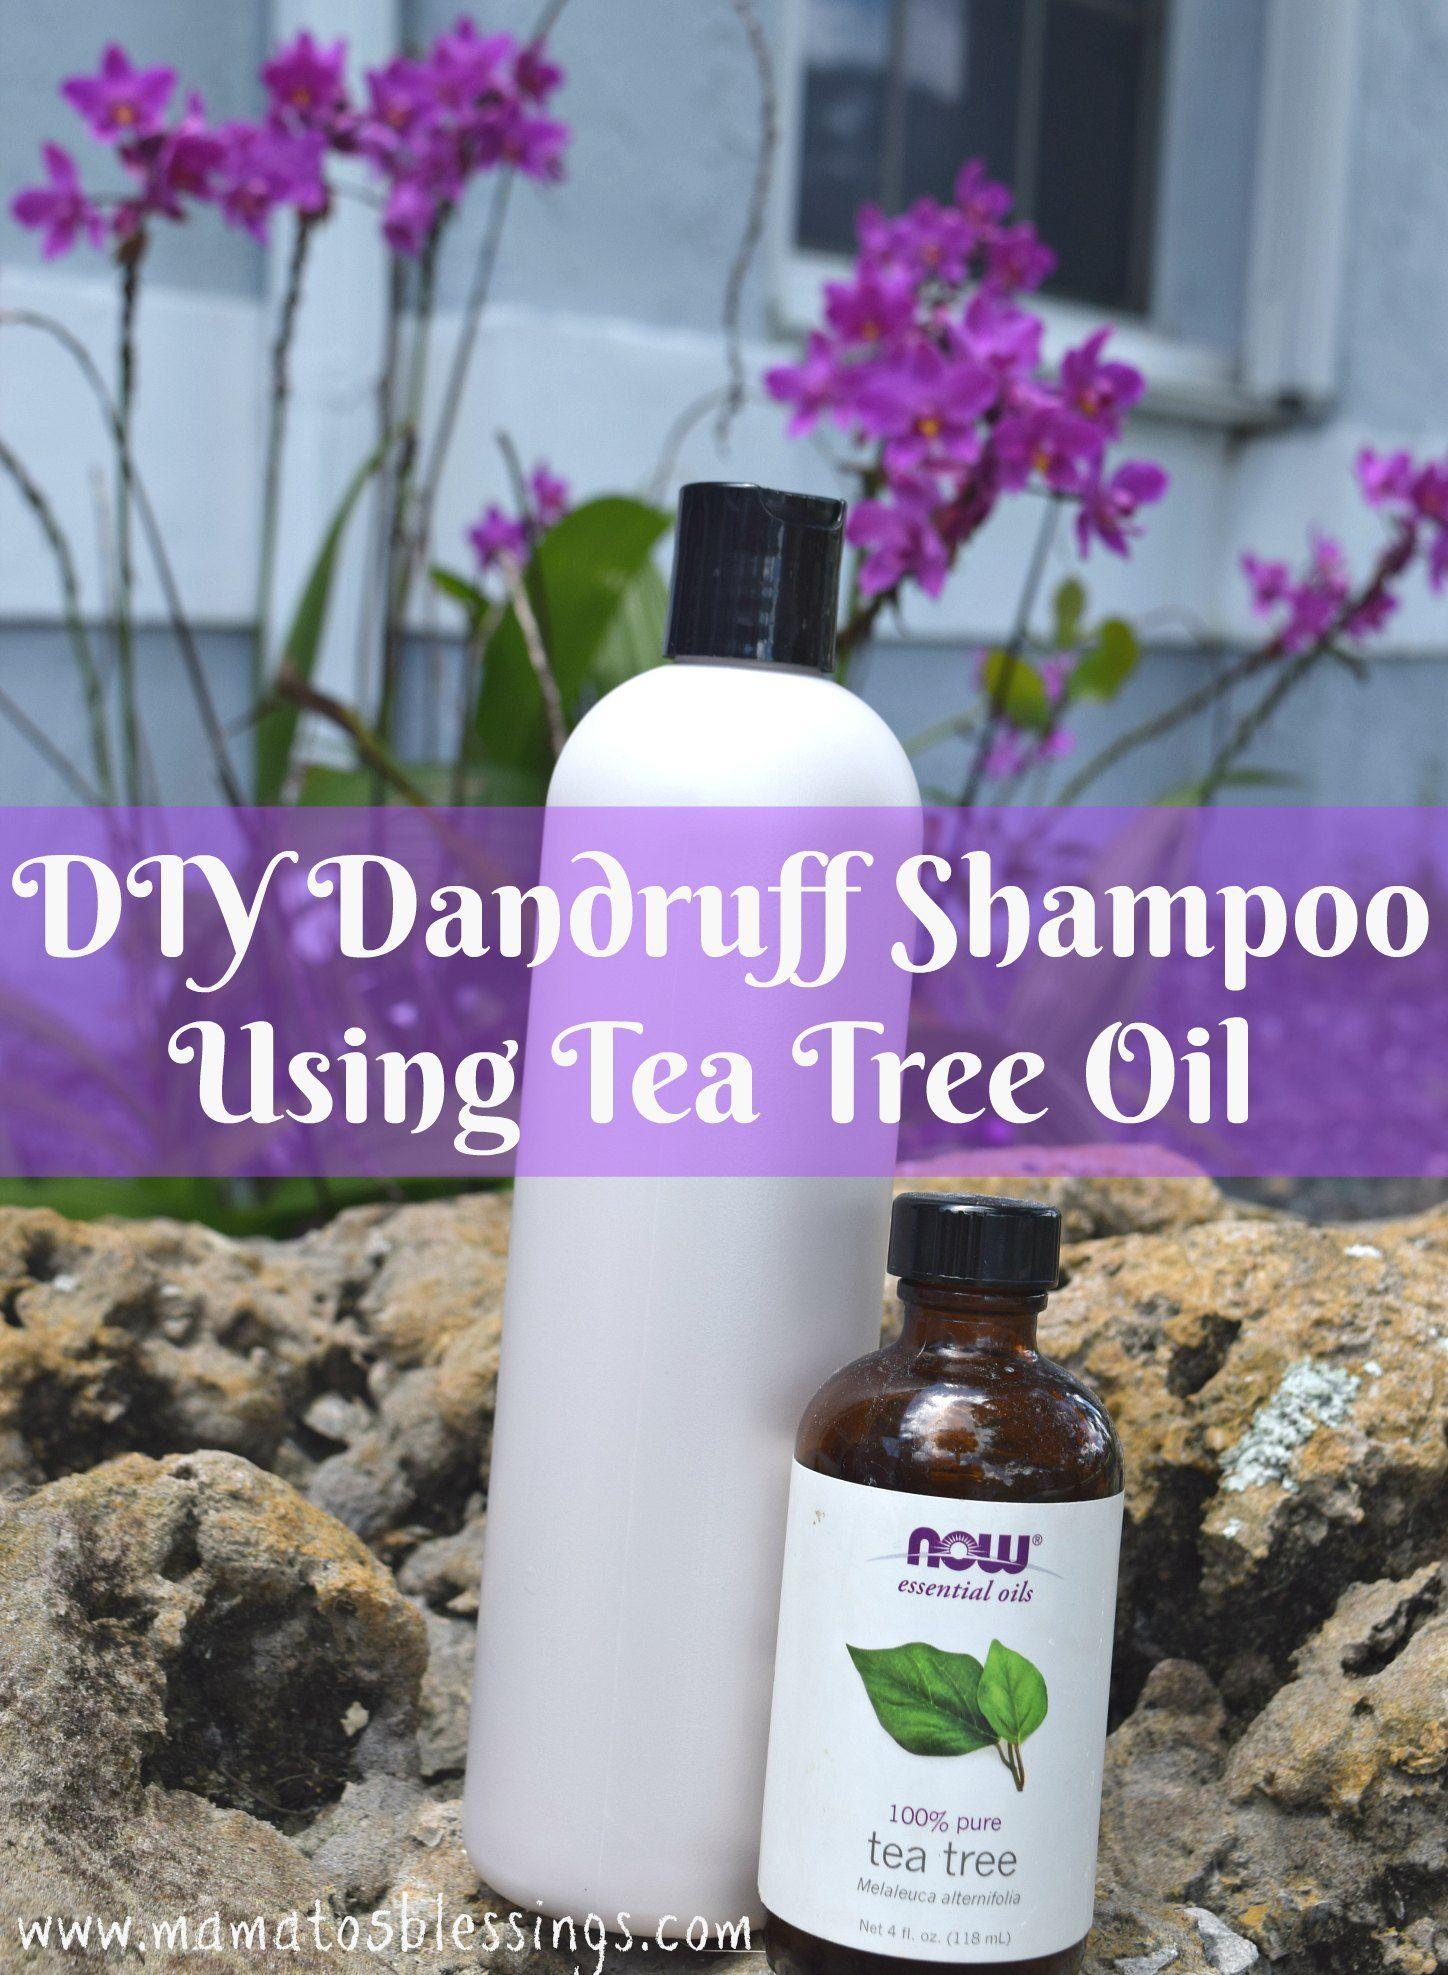 diy dandruff shampoo using tea tree oil | fashion / beauty , fashion